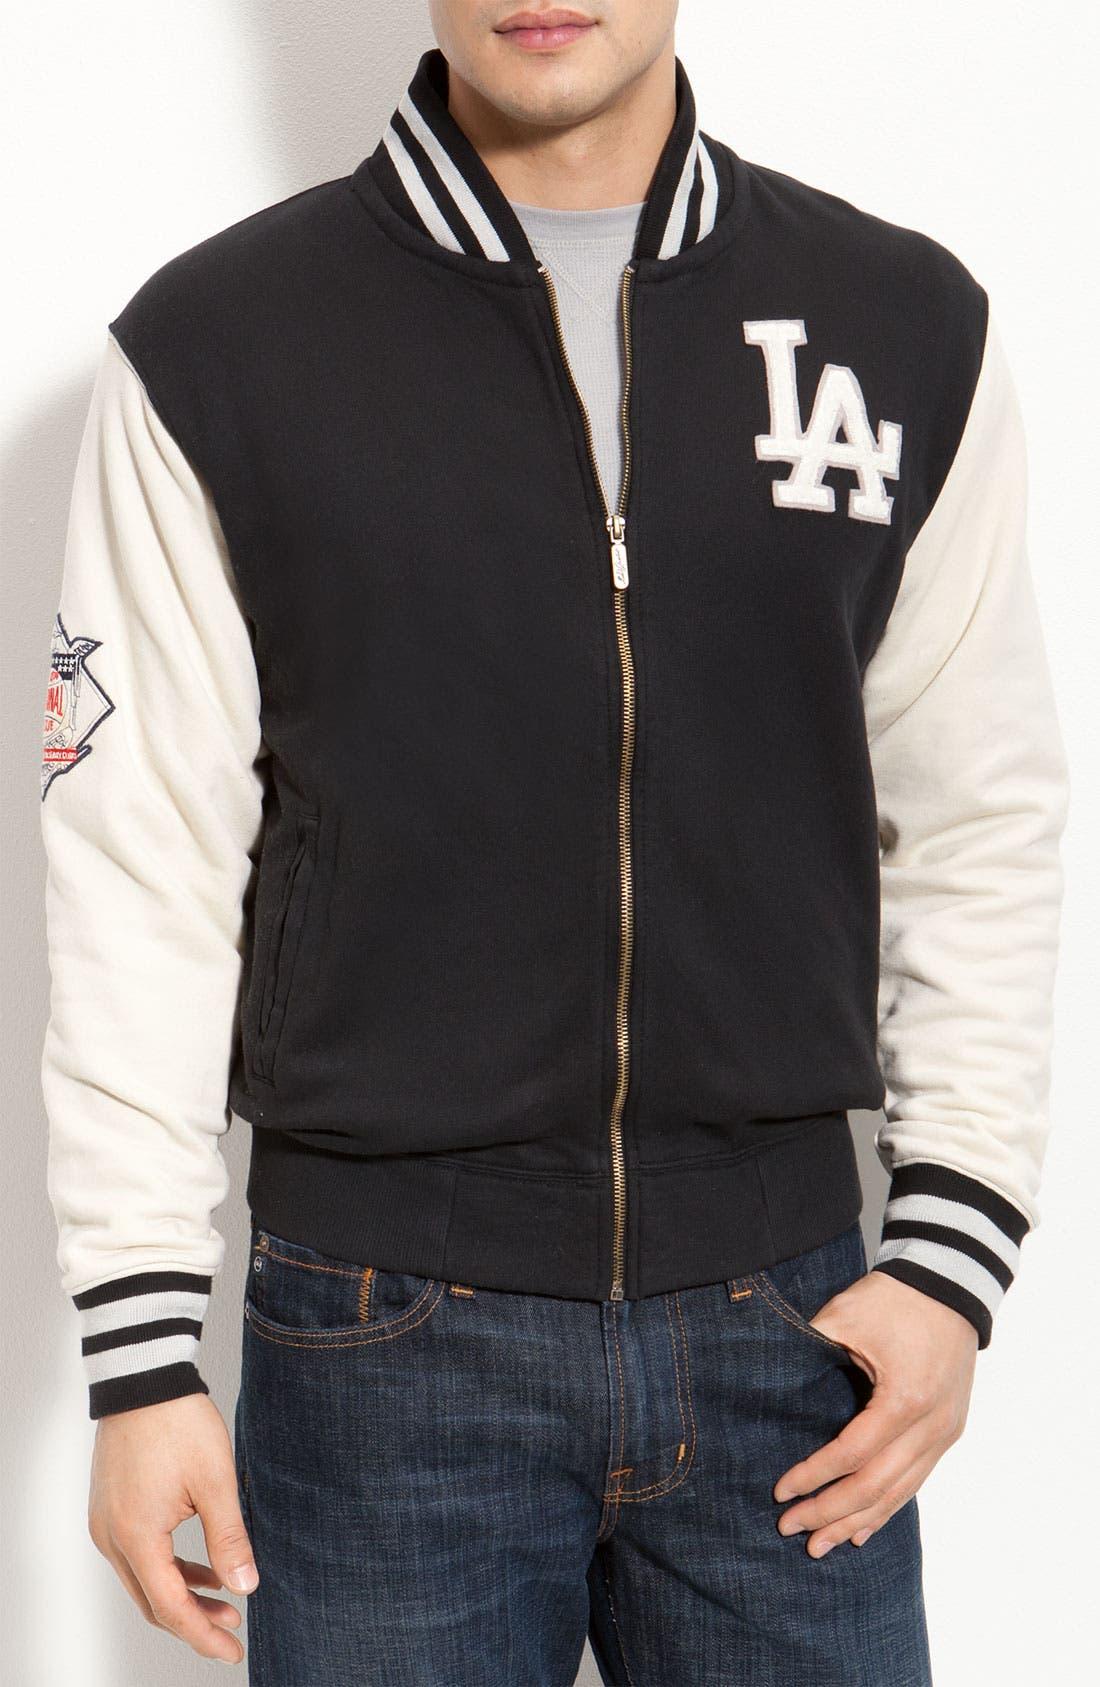 Alternate Image 1 Selected - Red Jacket 'Los Angeles Dodgers - Homeroom' Jacket